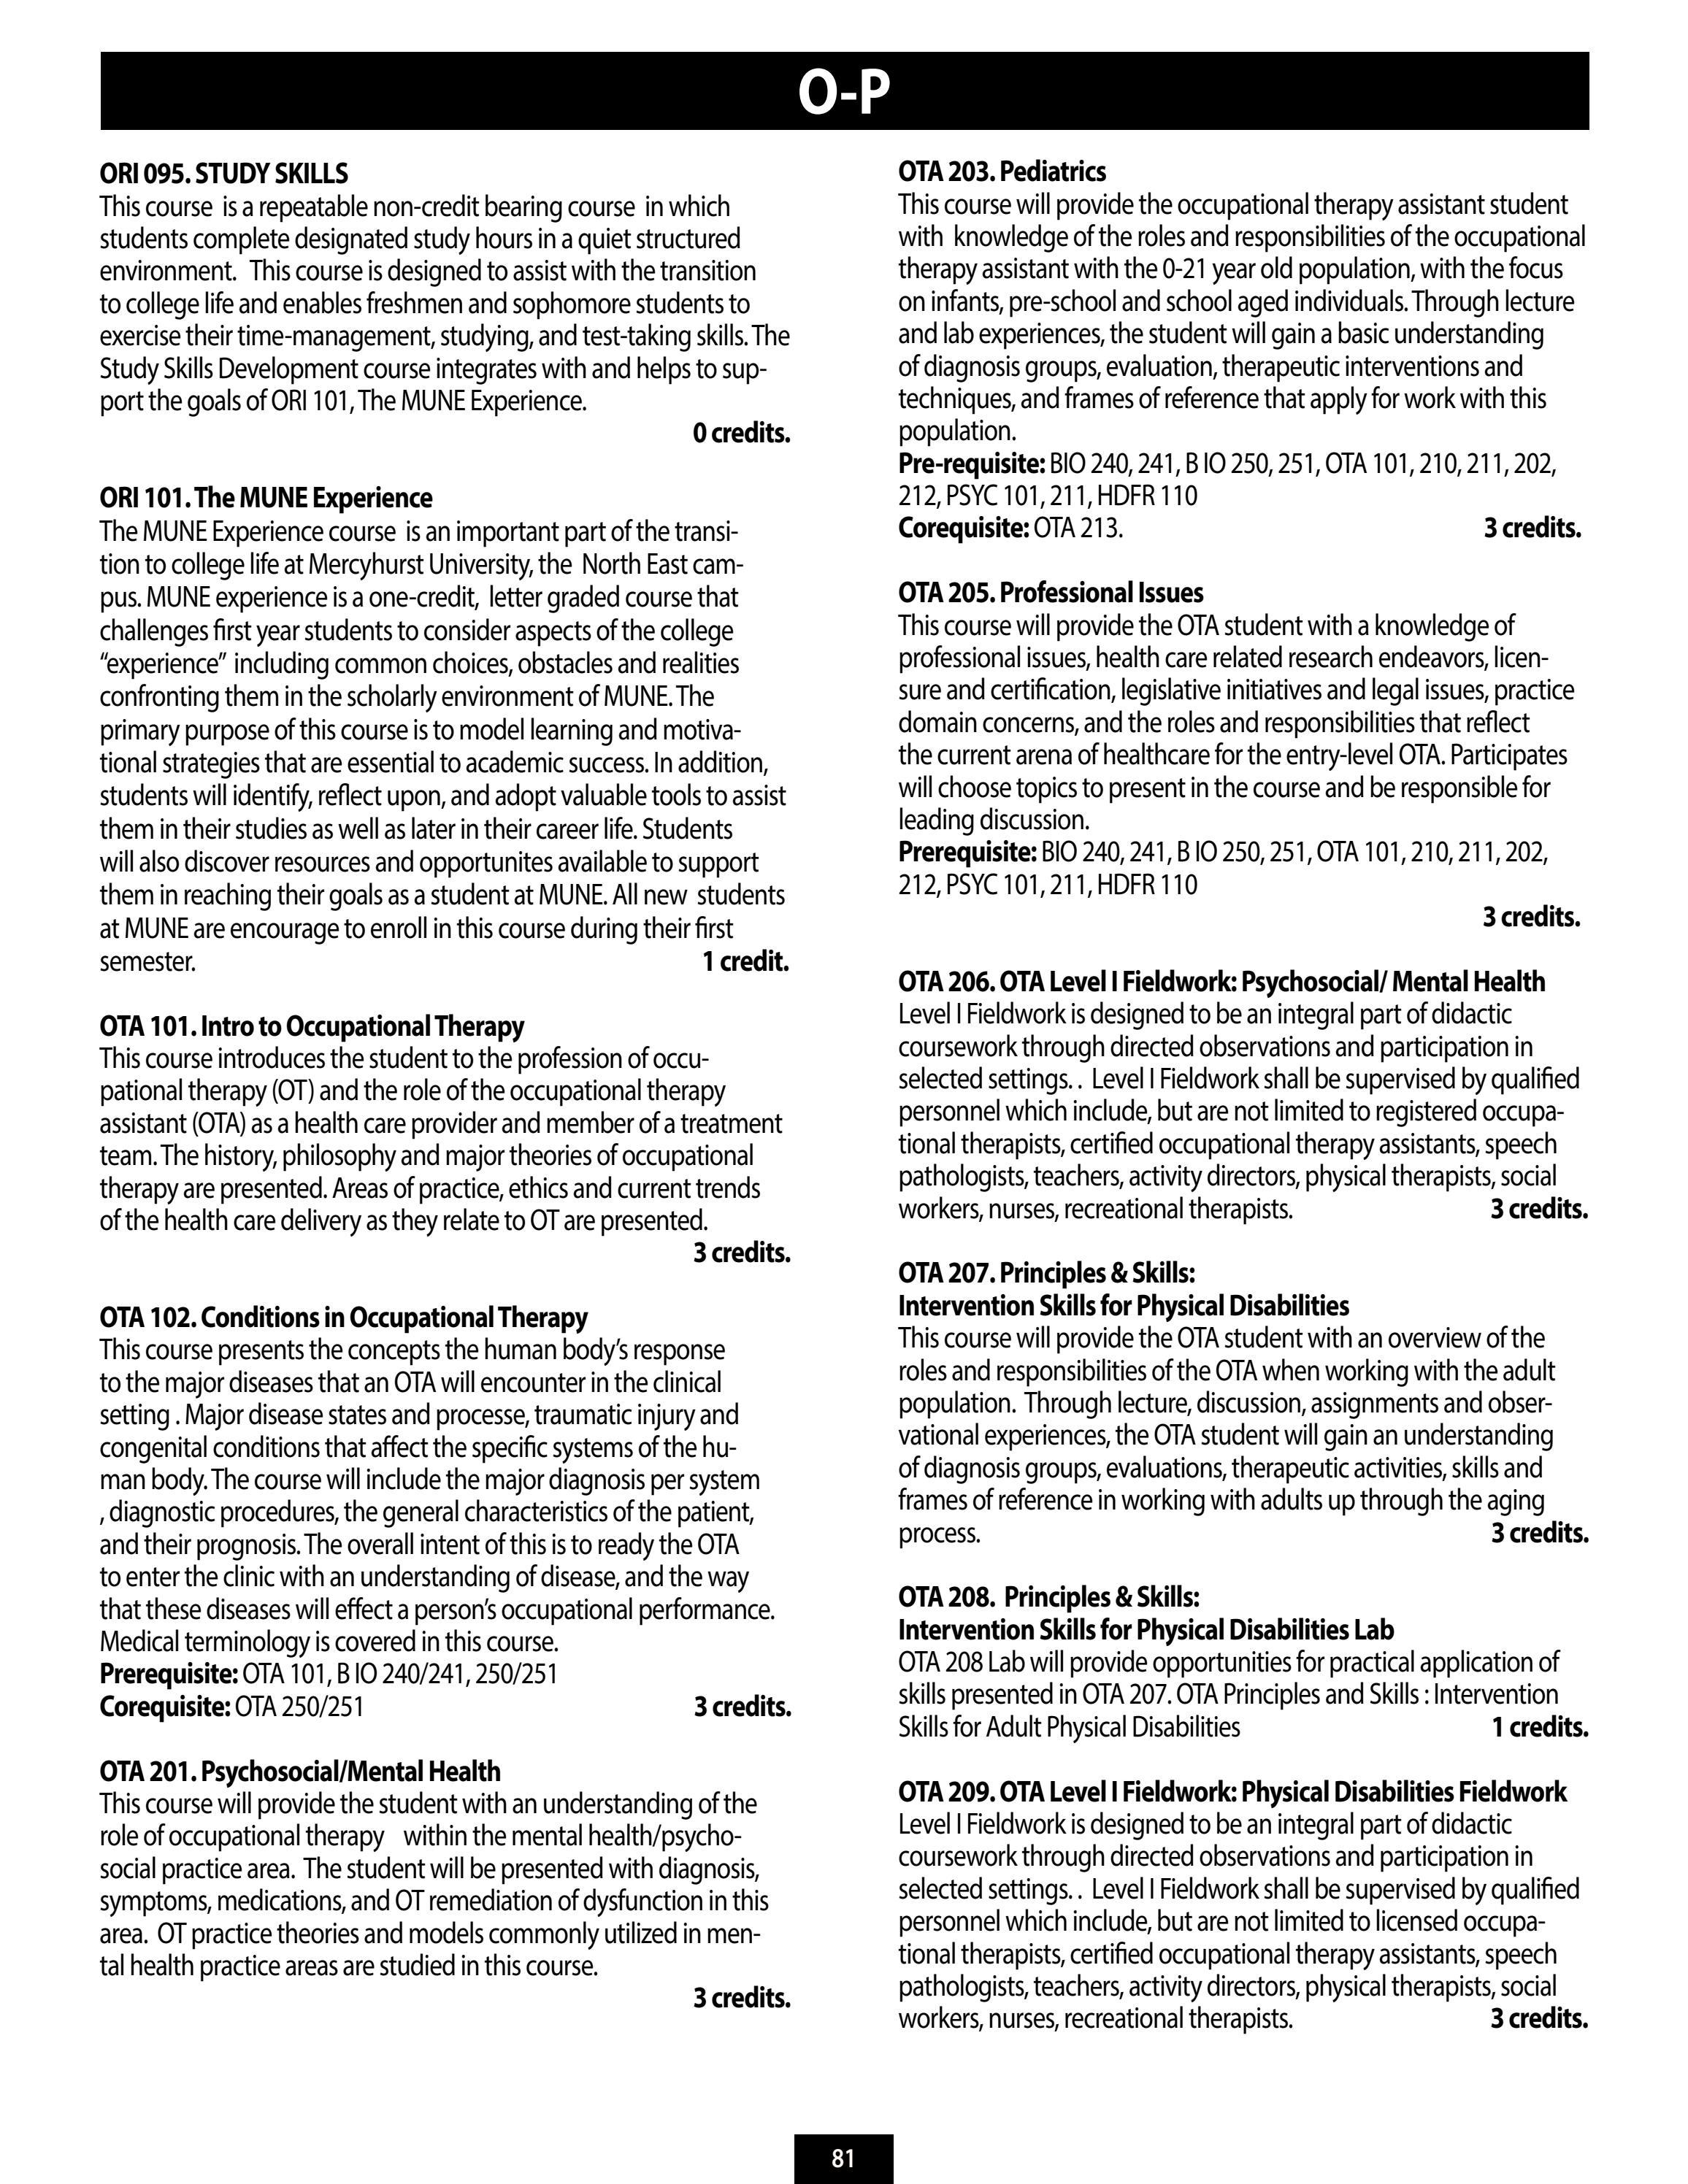 MNE Course Catalog 2013-2014 by MERCYHURST UNIVERSITY - issuu